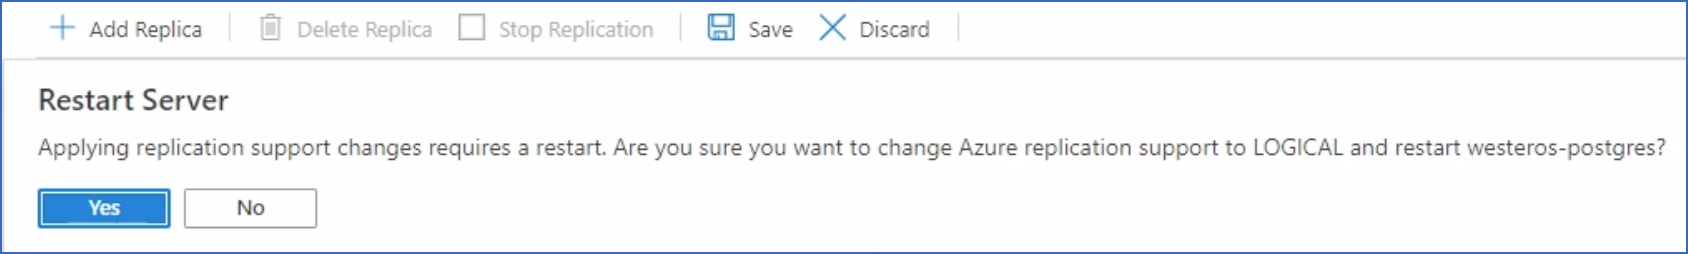 server restart message